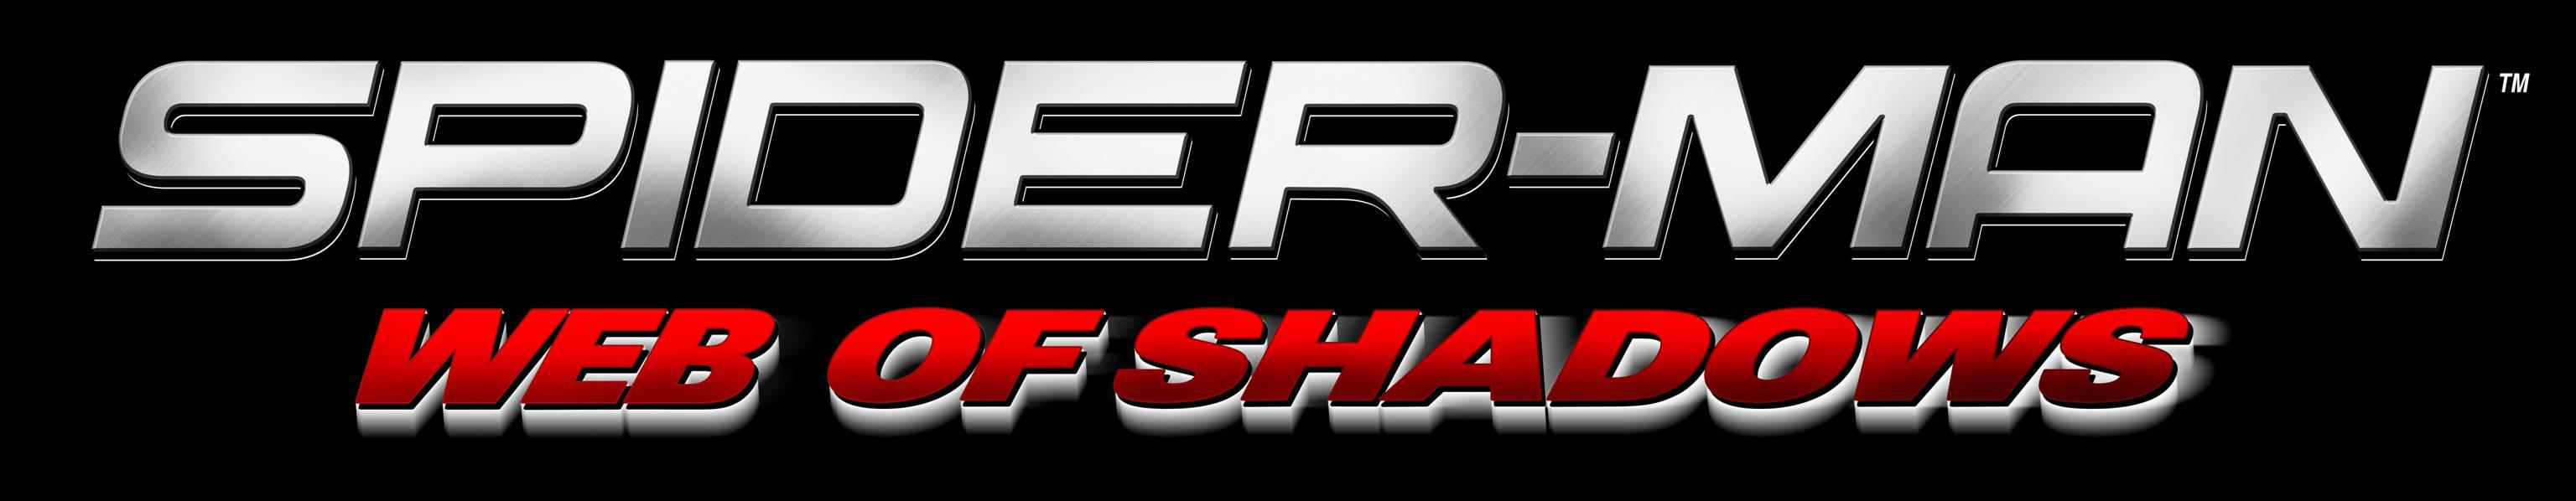 Логотип - Spider-Man: Web of Shadows Арт